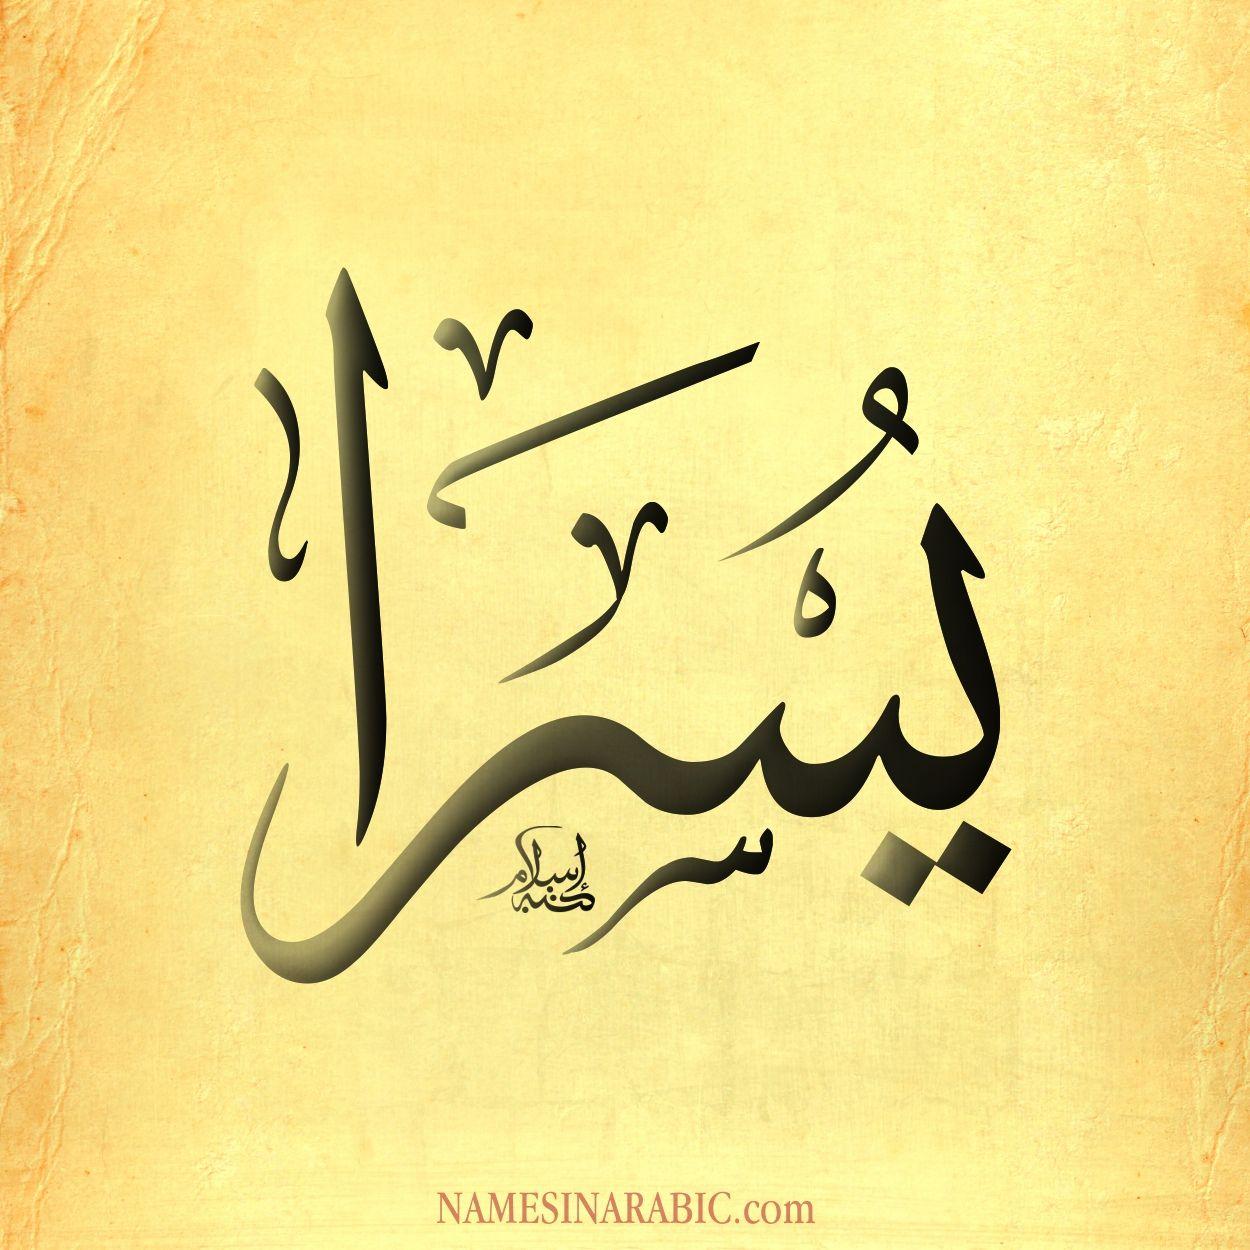 Dawar Siddiqui Arabic Calligraphy Art Arabic Calligraphy Design Name Design Art